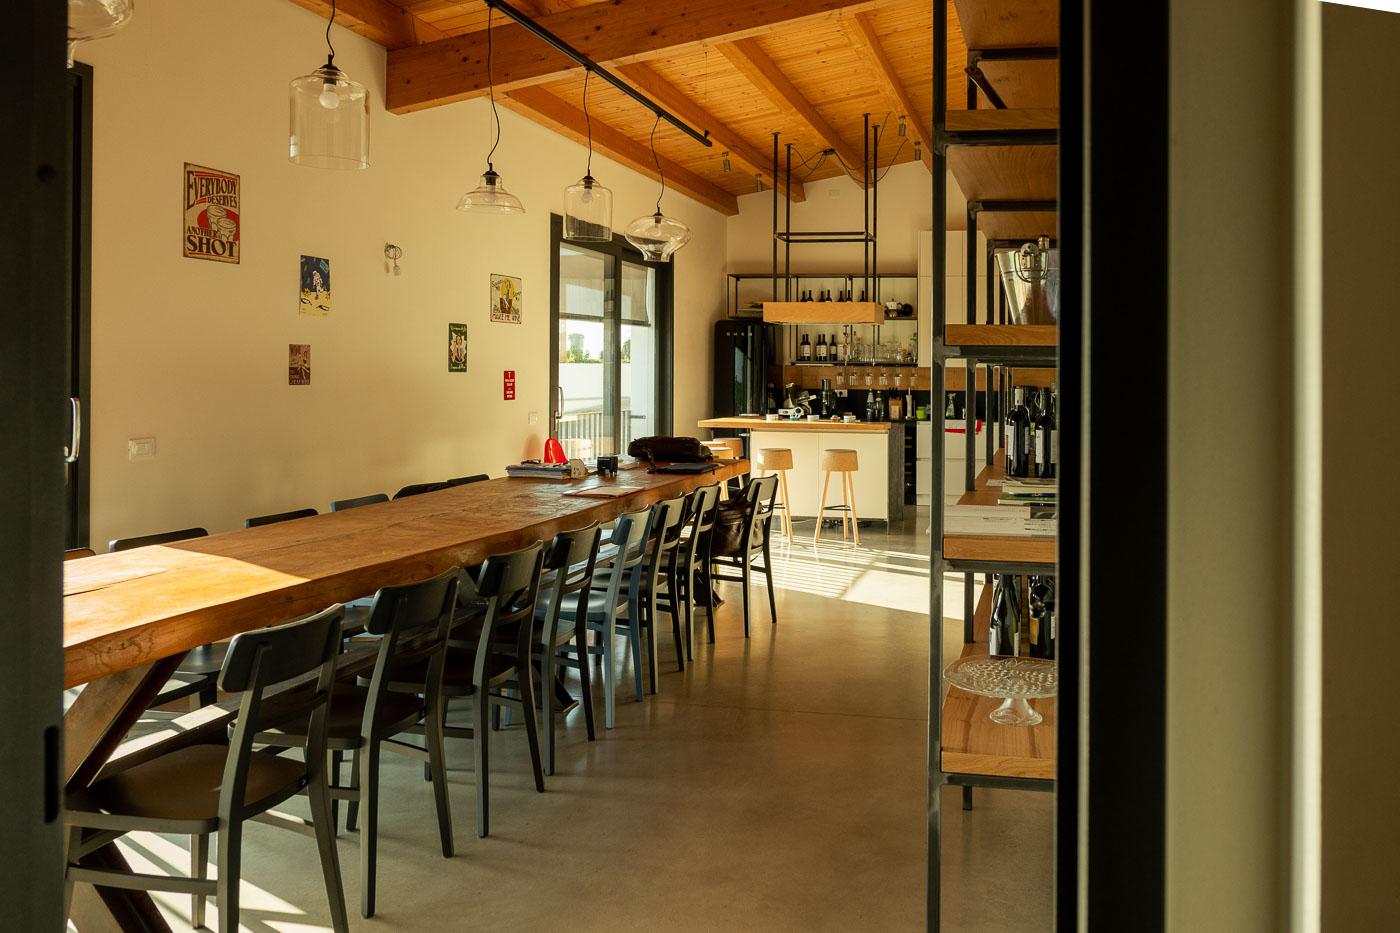 Svinamento-naturale-vino-uva-merlot-maule-sauro-fotografo-rui-L1120379_p_Lr_web